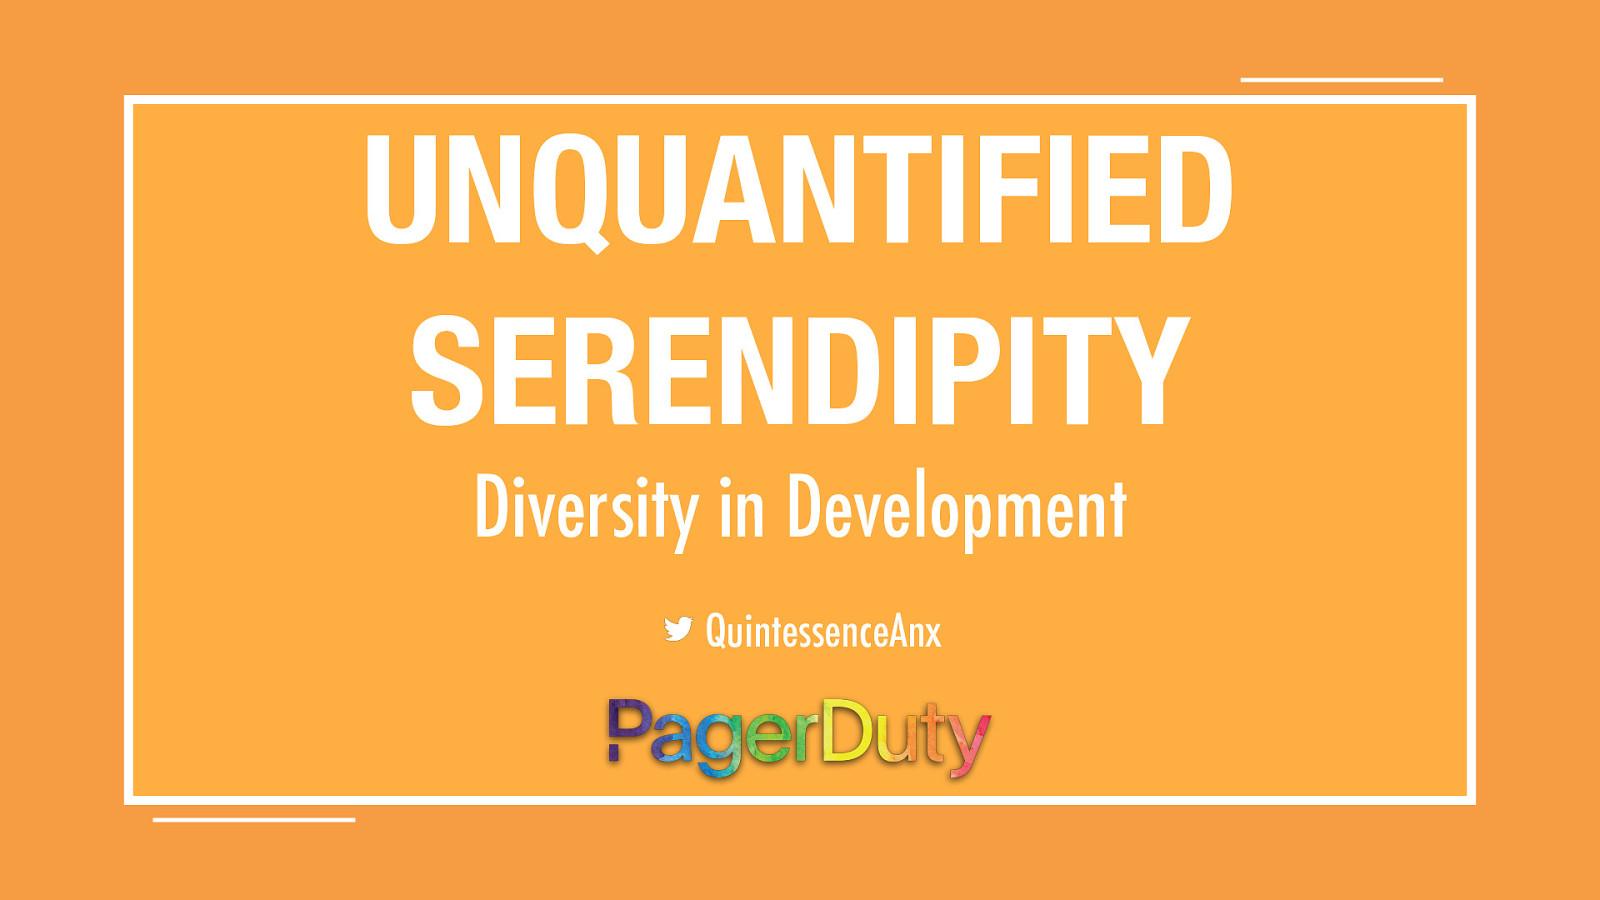 Unquantified Serendipity: Diversity in Development